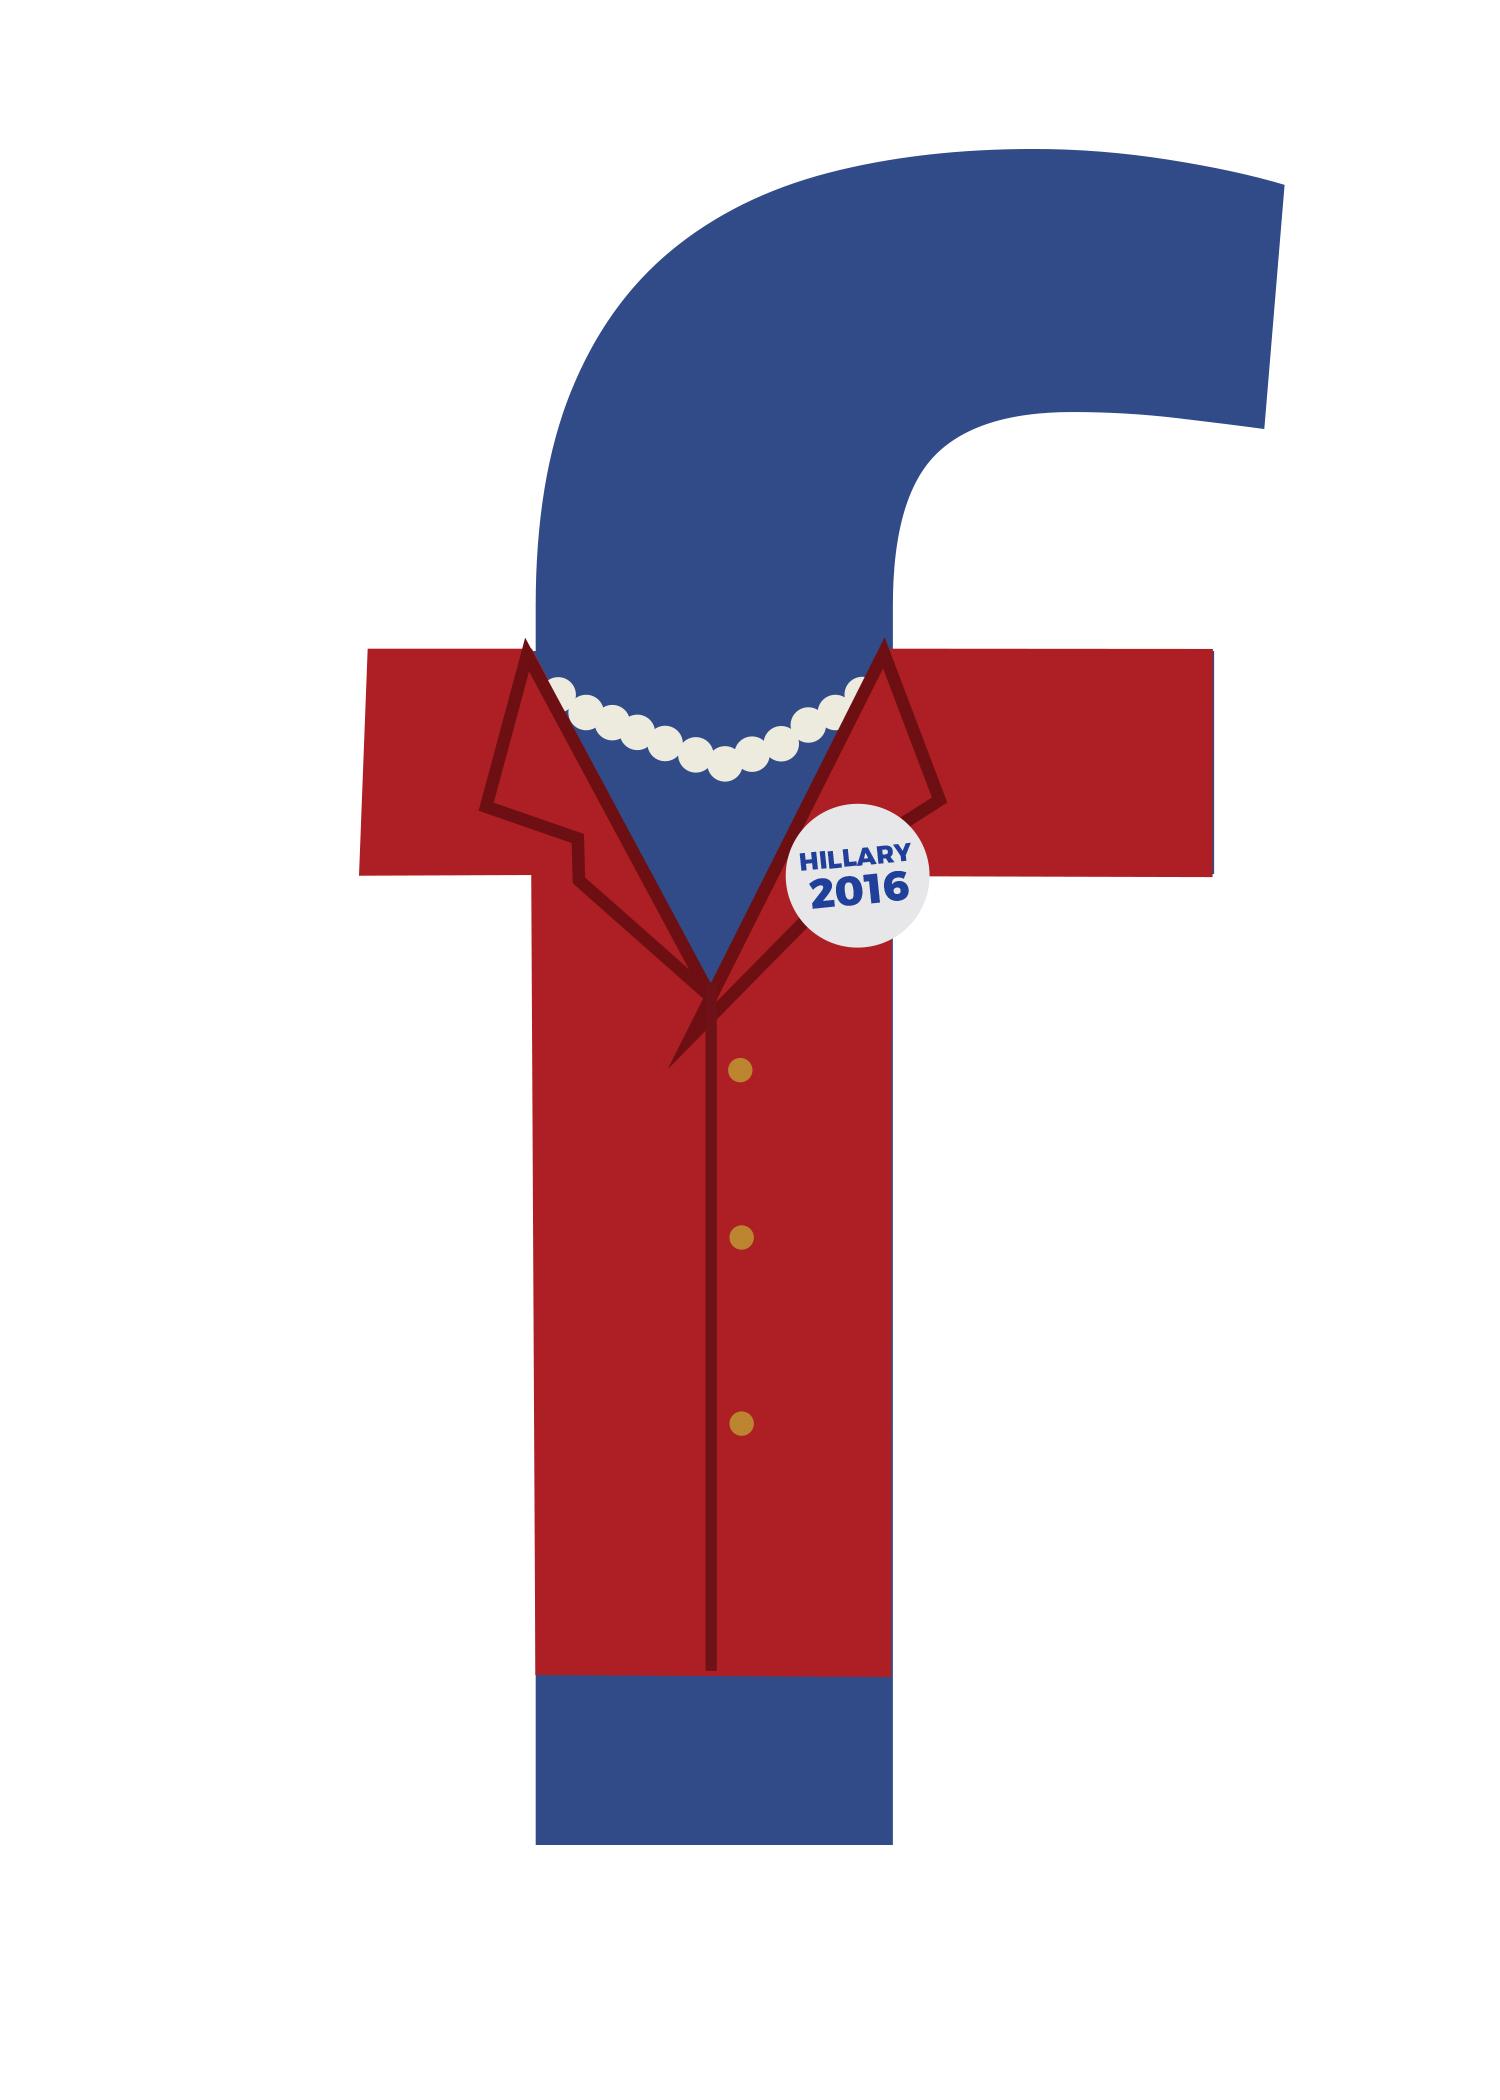 facebookhillary.jpg